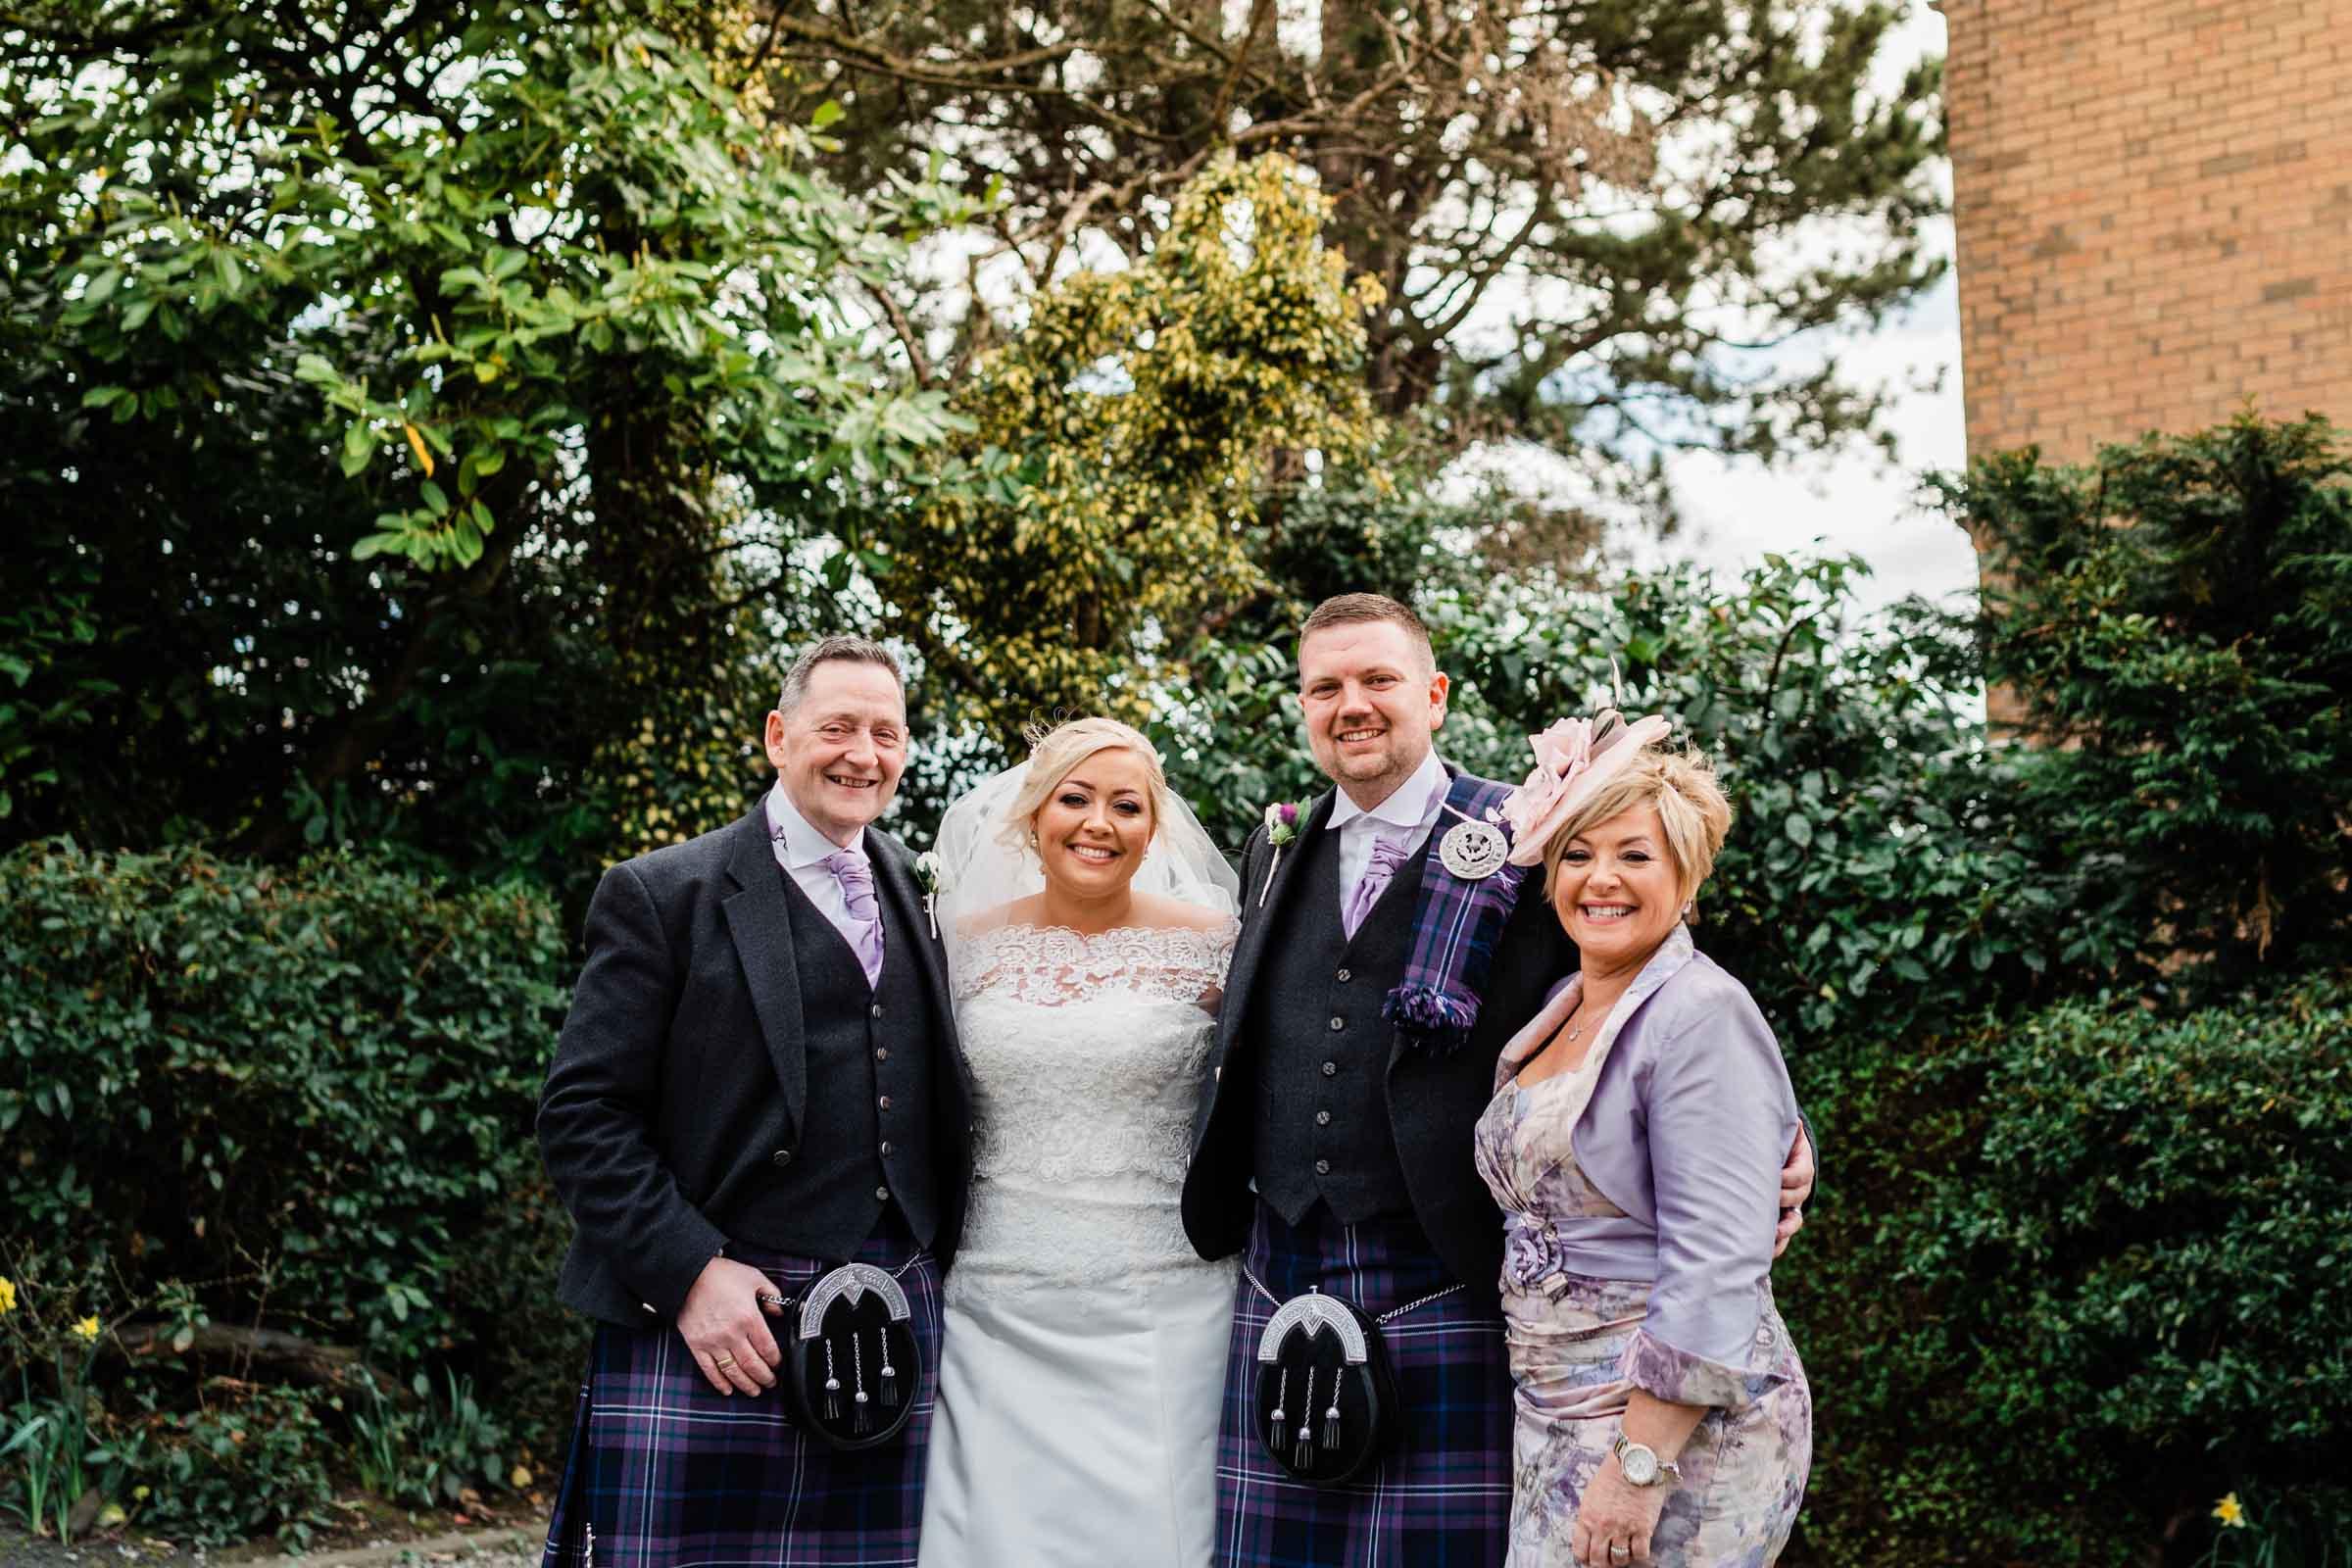 motherwell-moorings-wedding-photographer-dearlyphotography (44 of 77).jpg